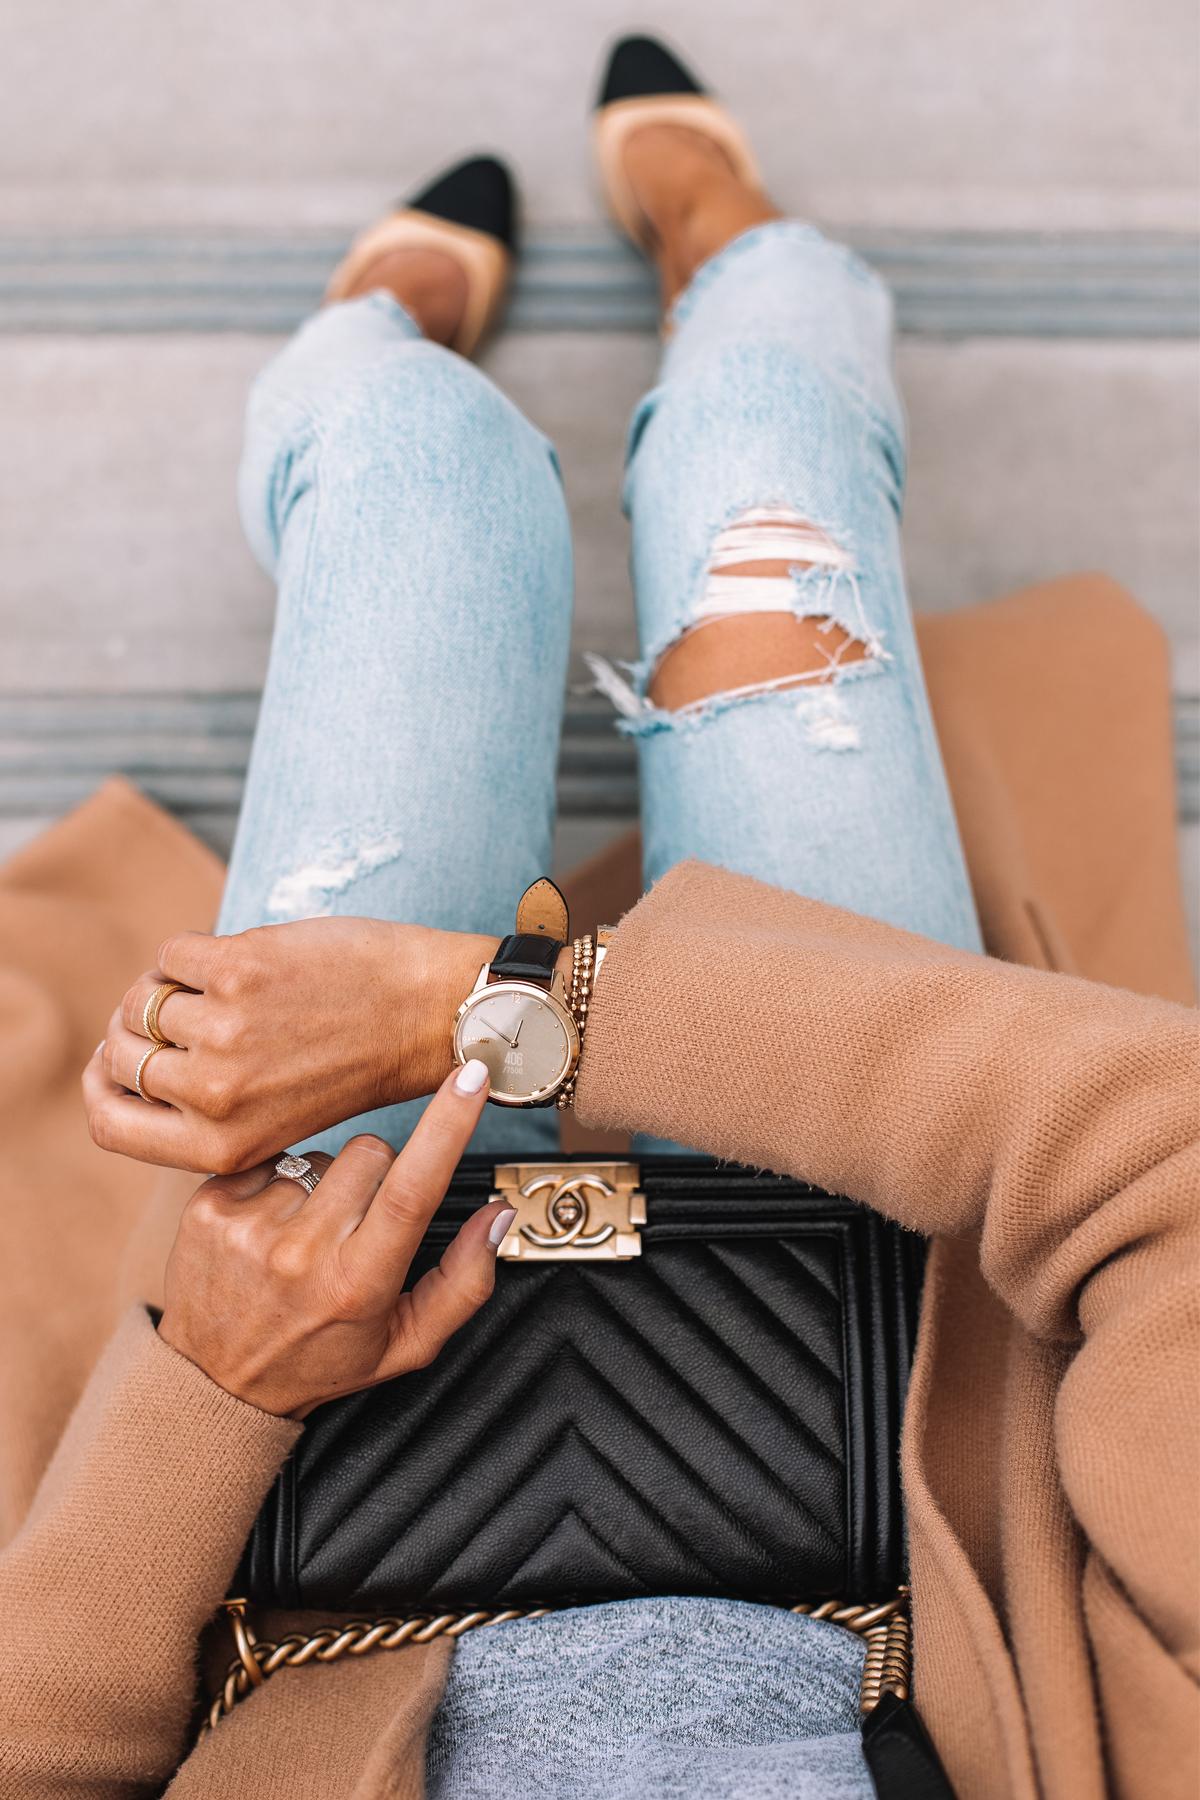 Fashion Jackson Wearing Garmin Vivomove Luxe Smart Watch Tan Coatigan Ripped Jeans Chanel Handbag